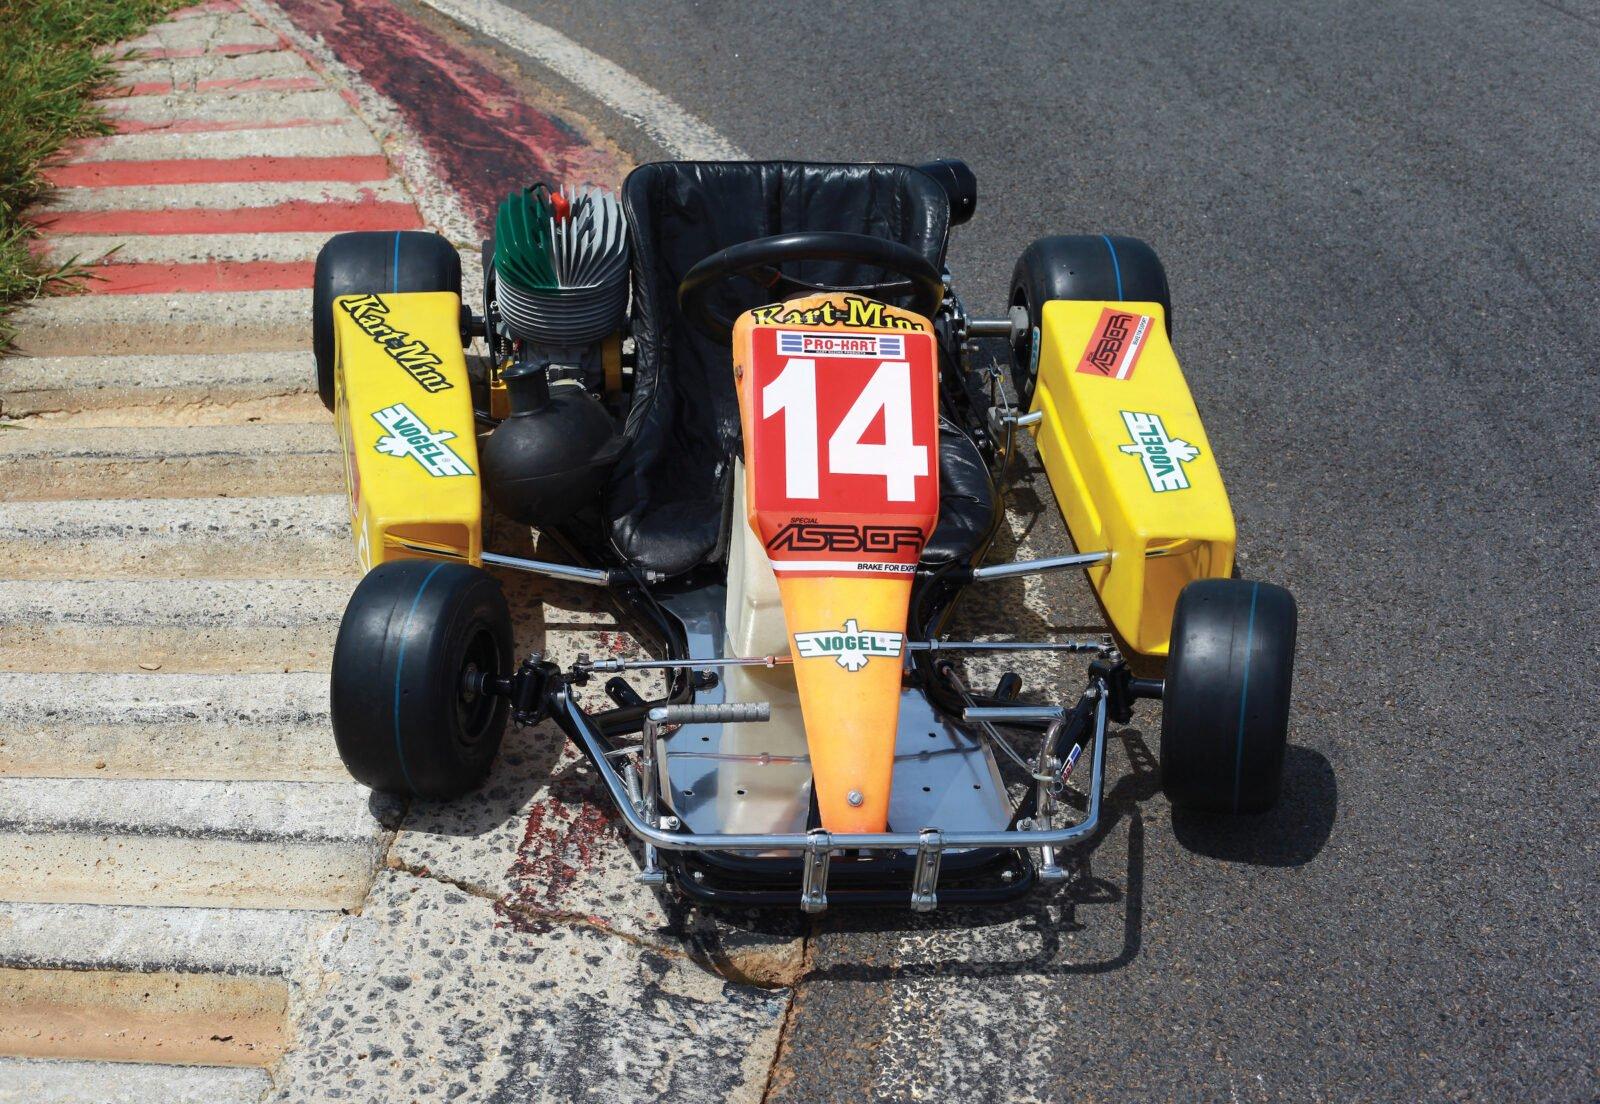 Ayrton Senna S Last Kart He Drove It 6 Weeks Before His Death